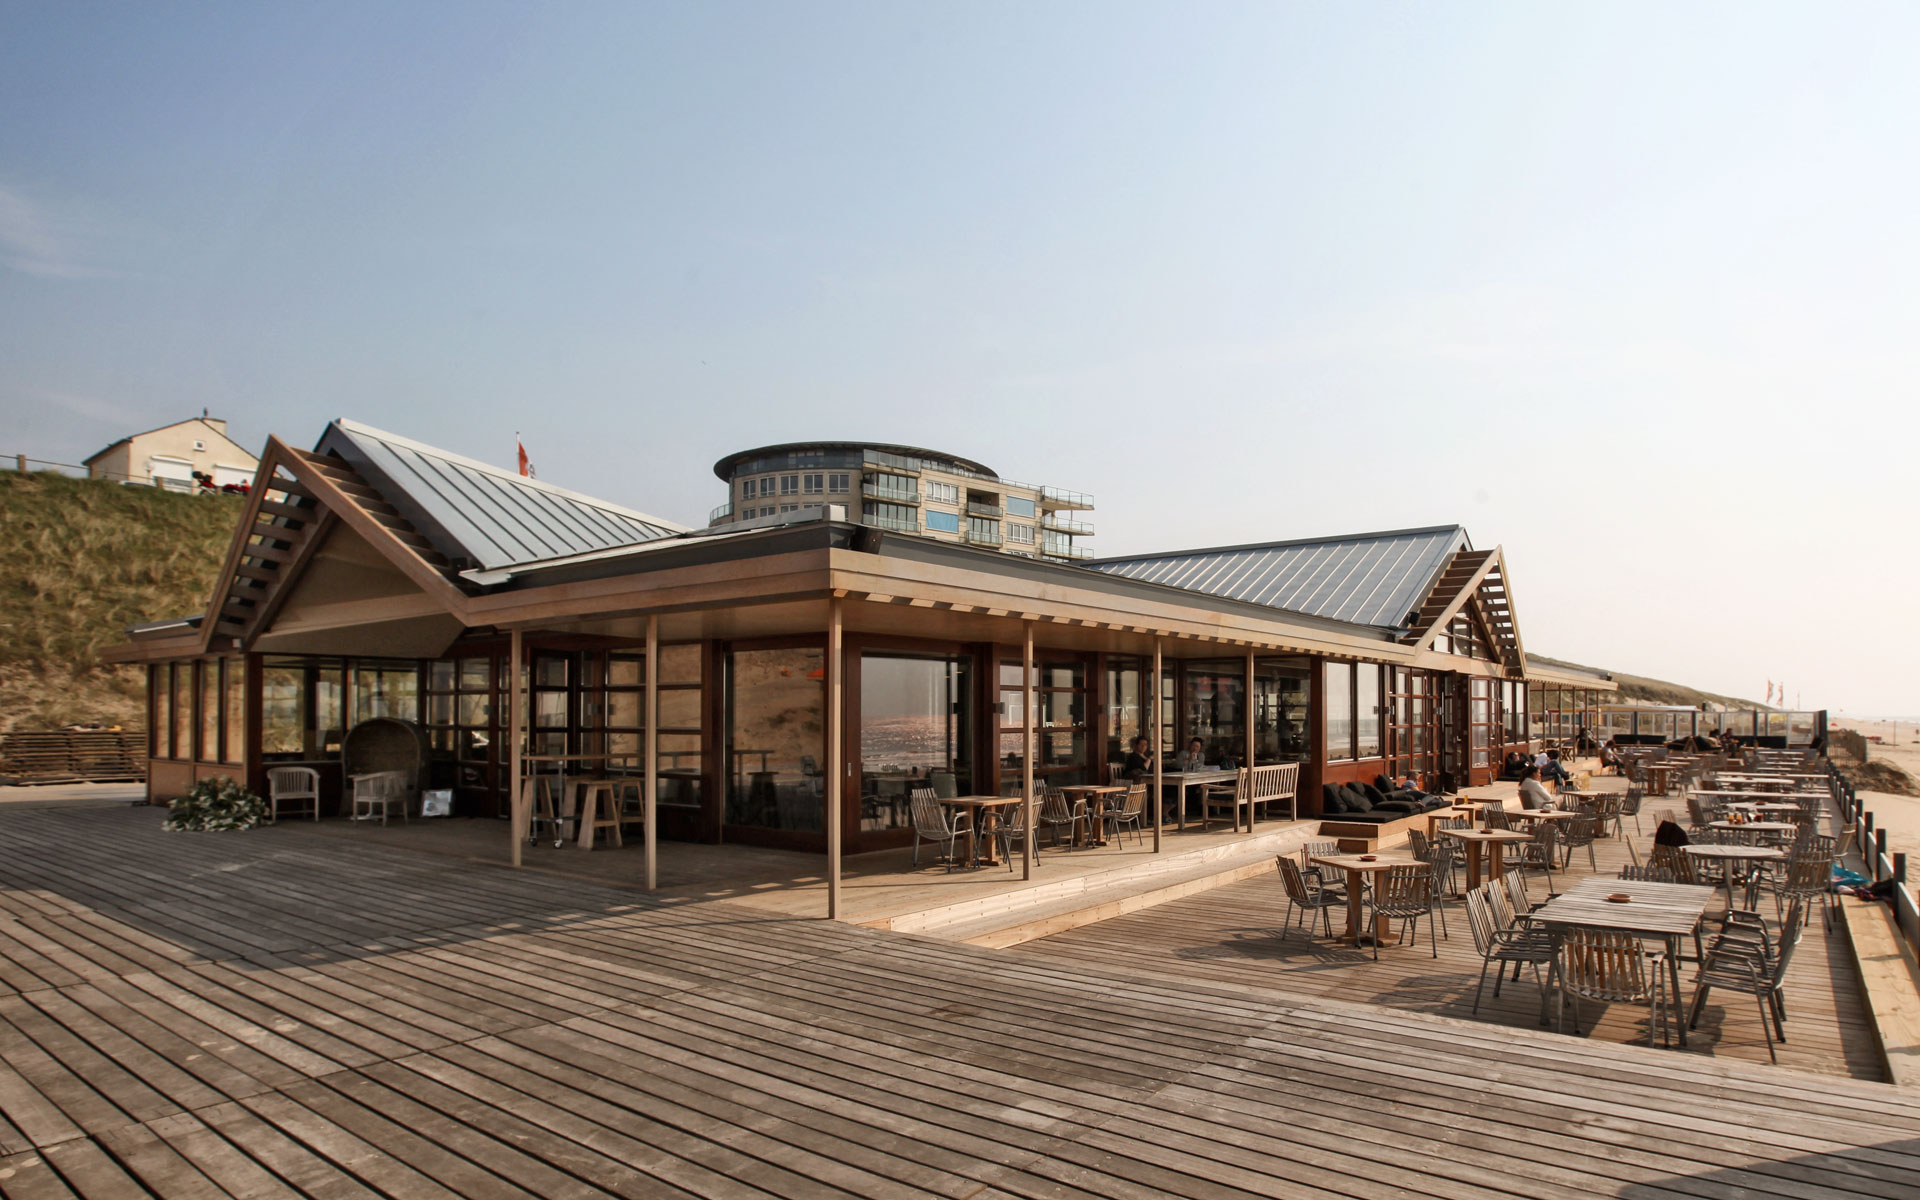 Paviljoen Tijn Akersloot Zandvoort - BINT architecten